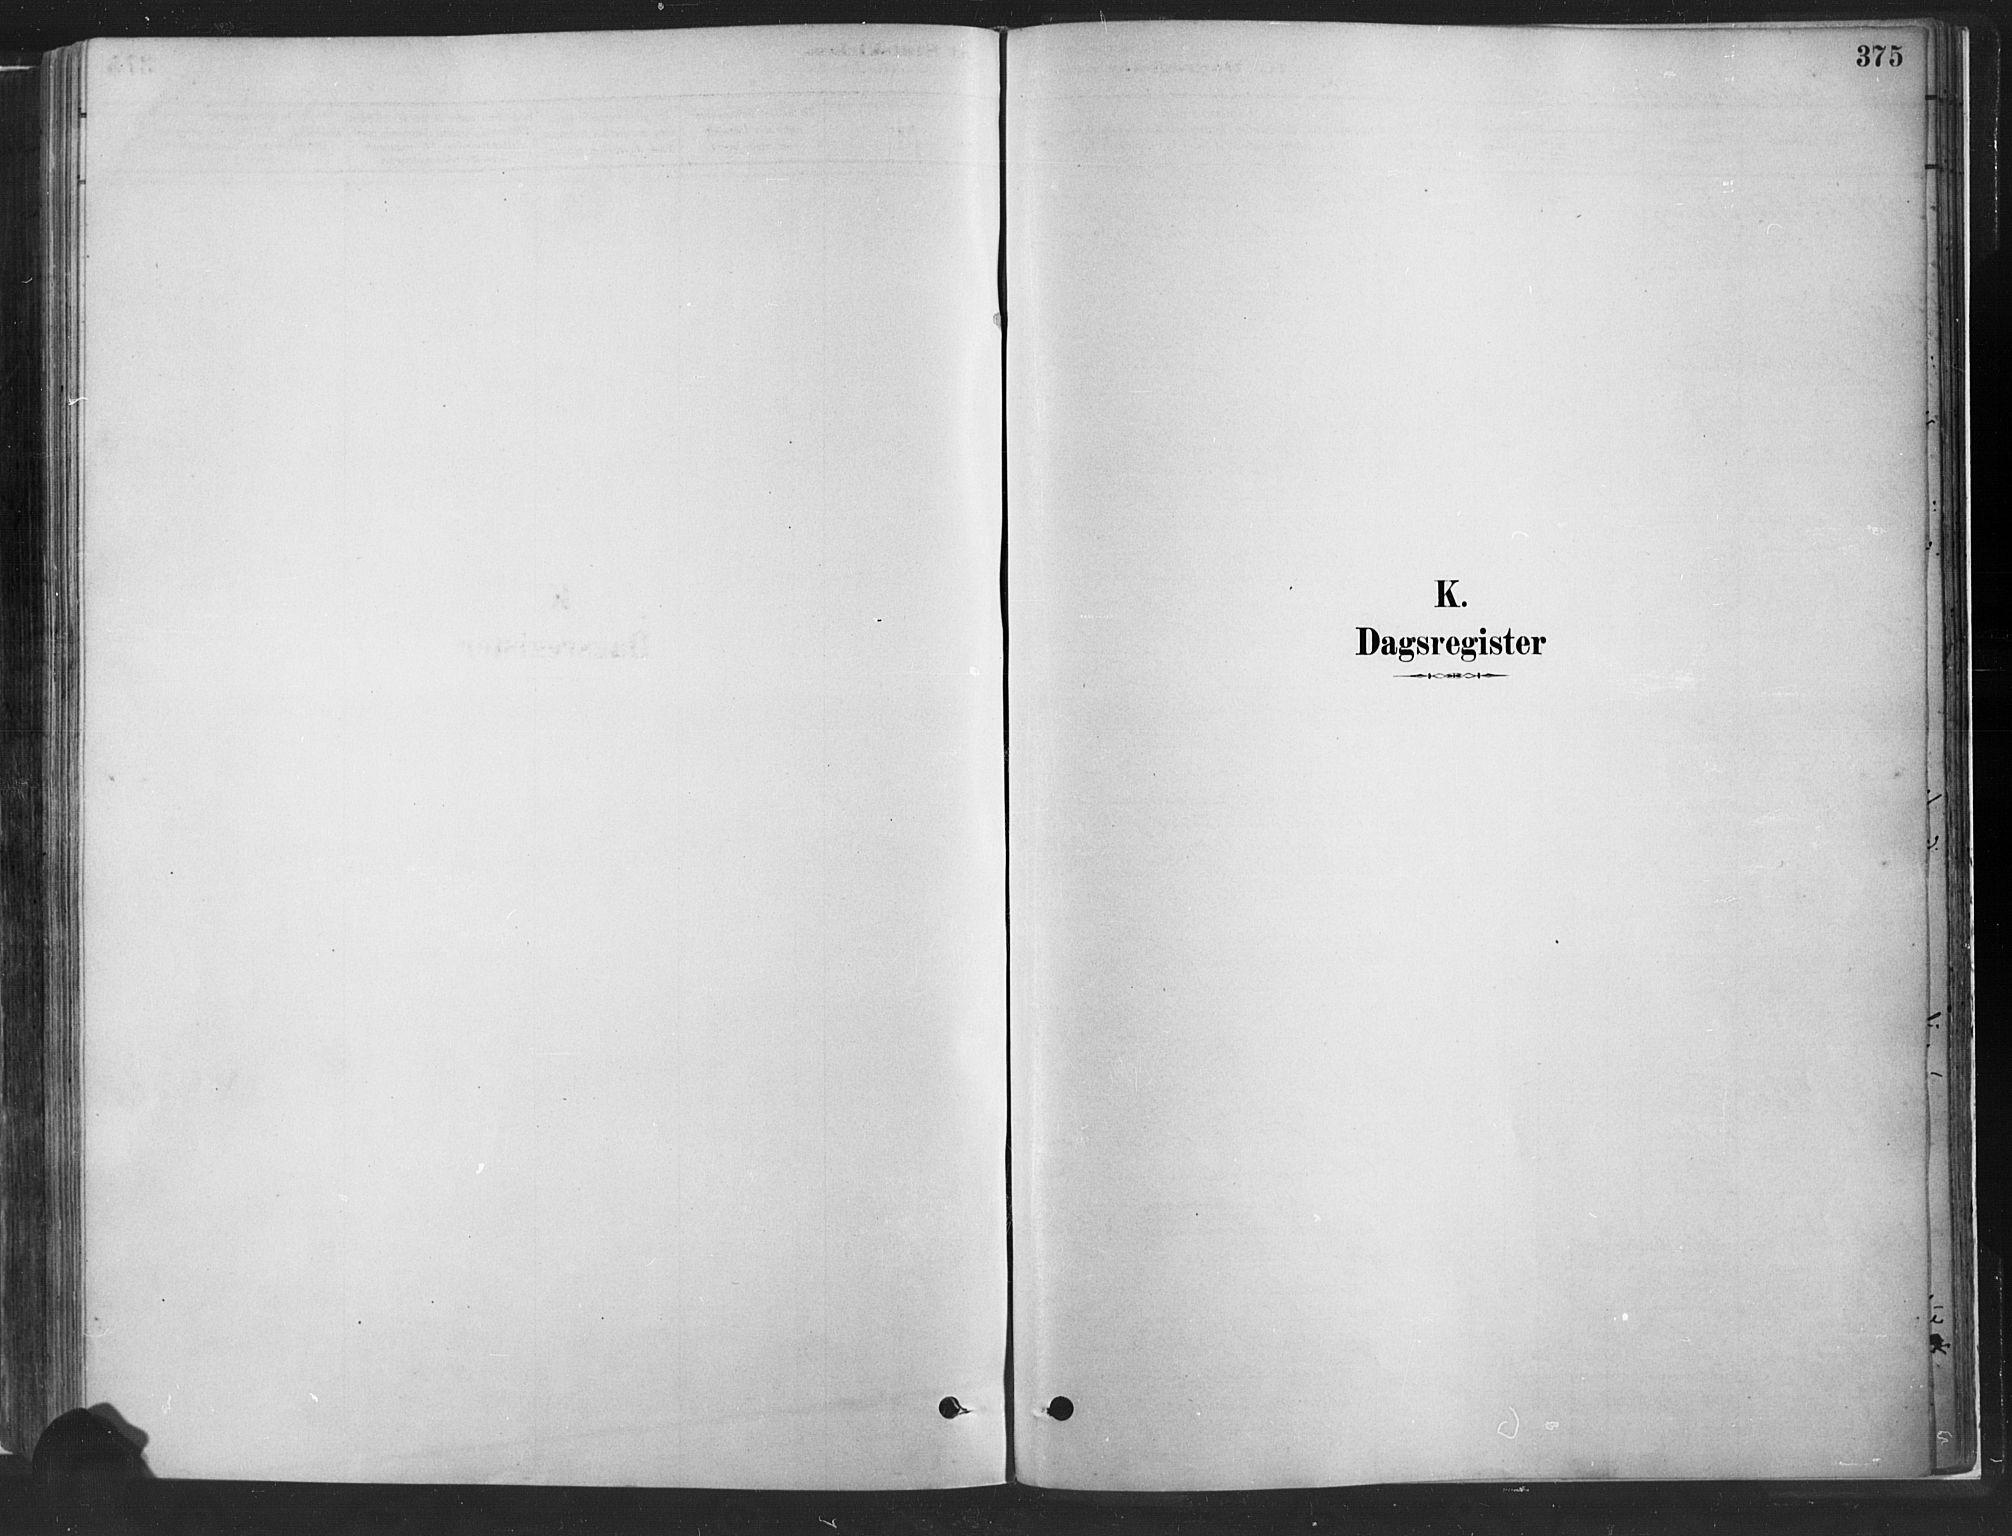 SAH, Fåberg prestekontor, H/Ha/Haa/L0010: Parish register (official) no. 10, 1879-1900, p. 375